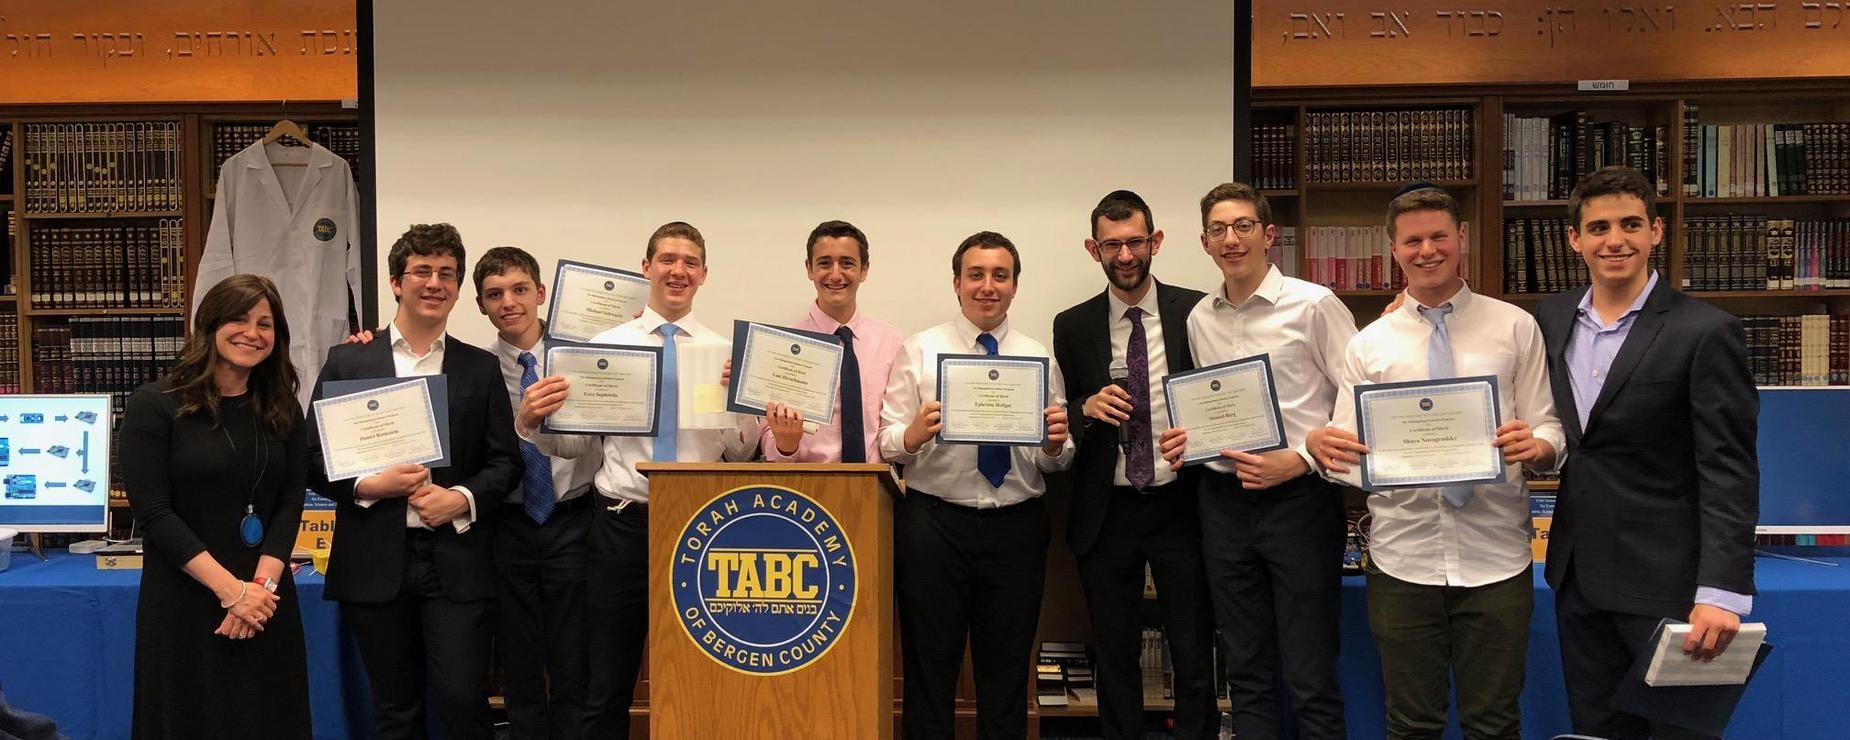 Torah Academy of Bergen County